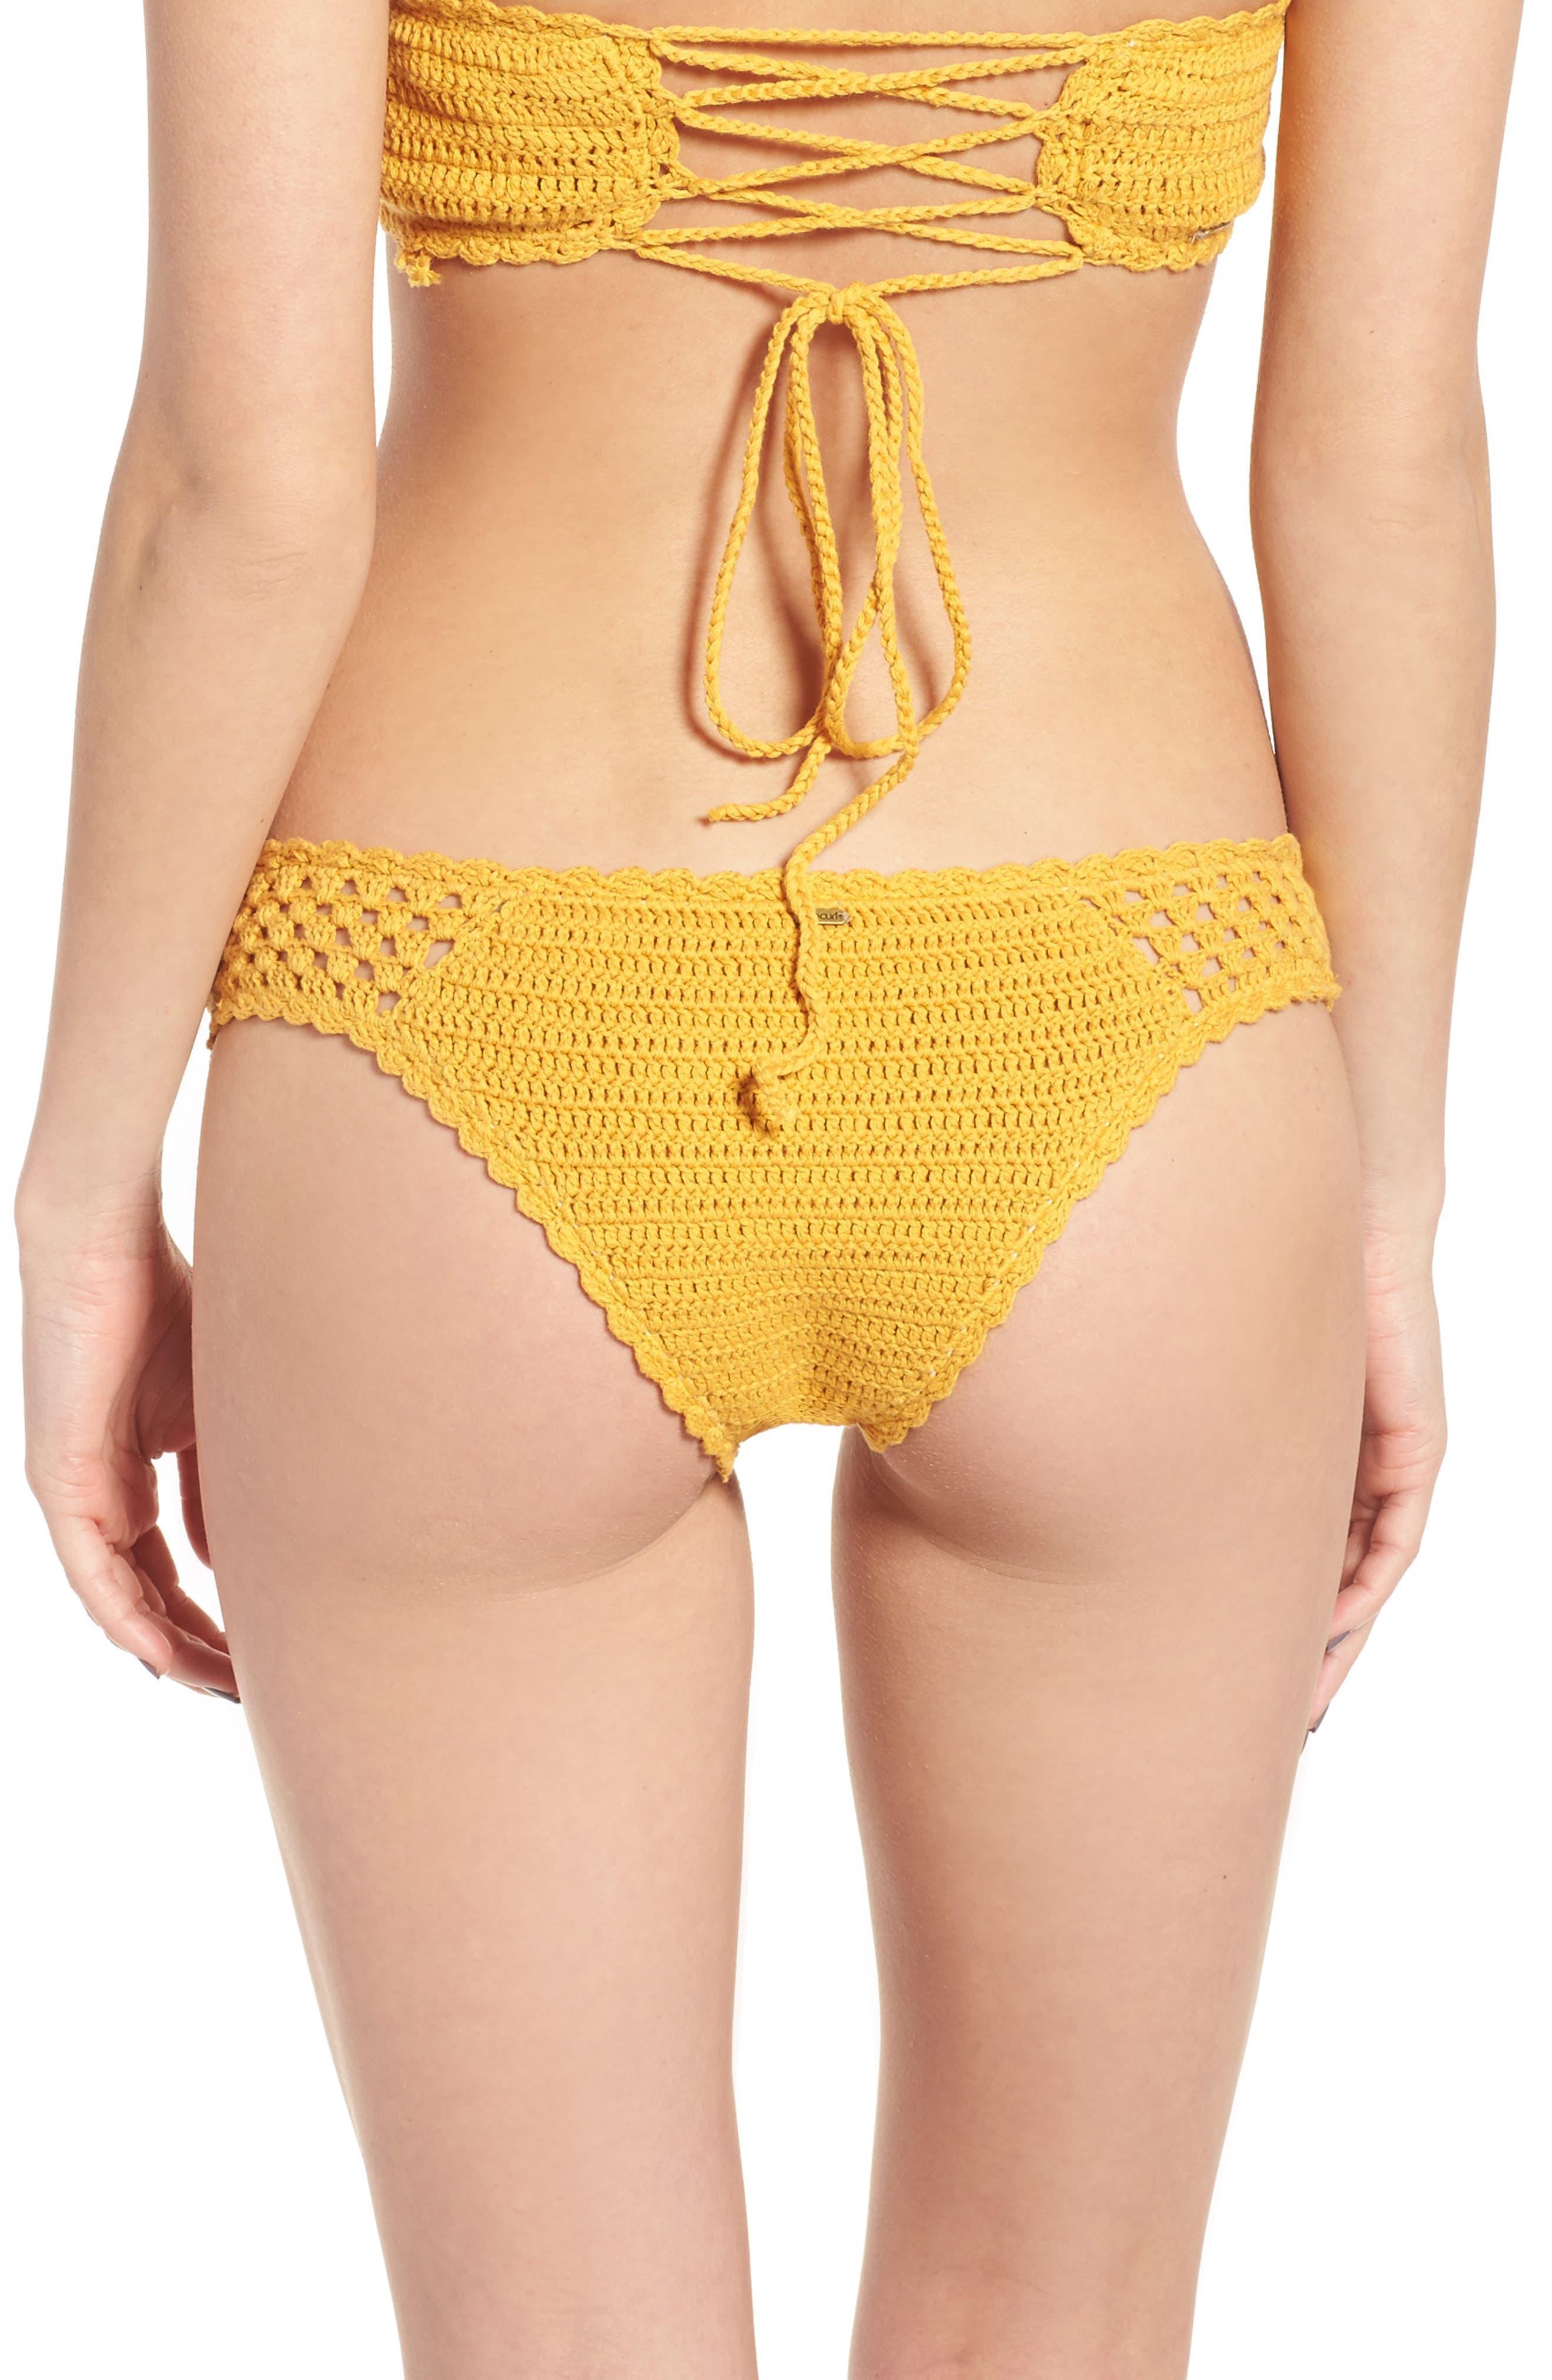 Rip Curl Topanga Luxe Crochet Hipster Bikini Bottoms